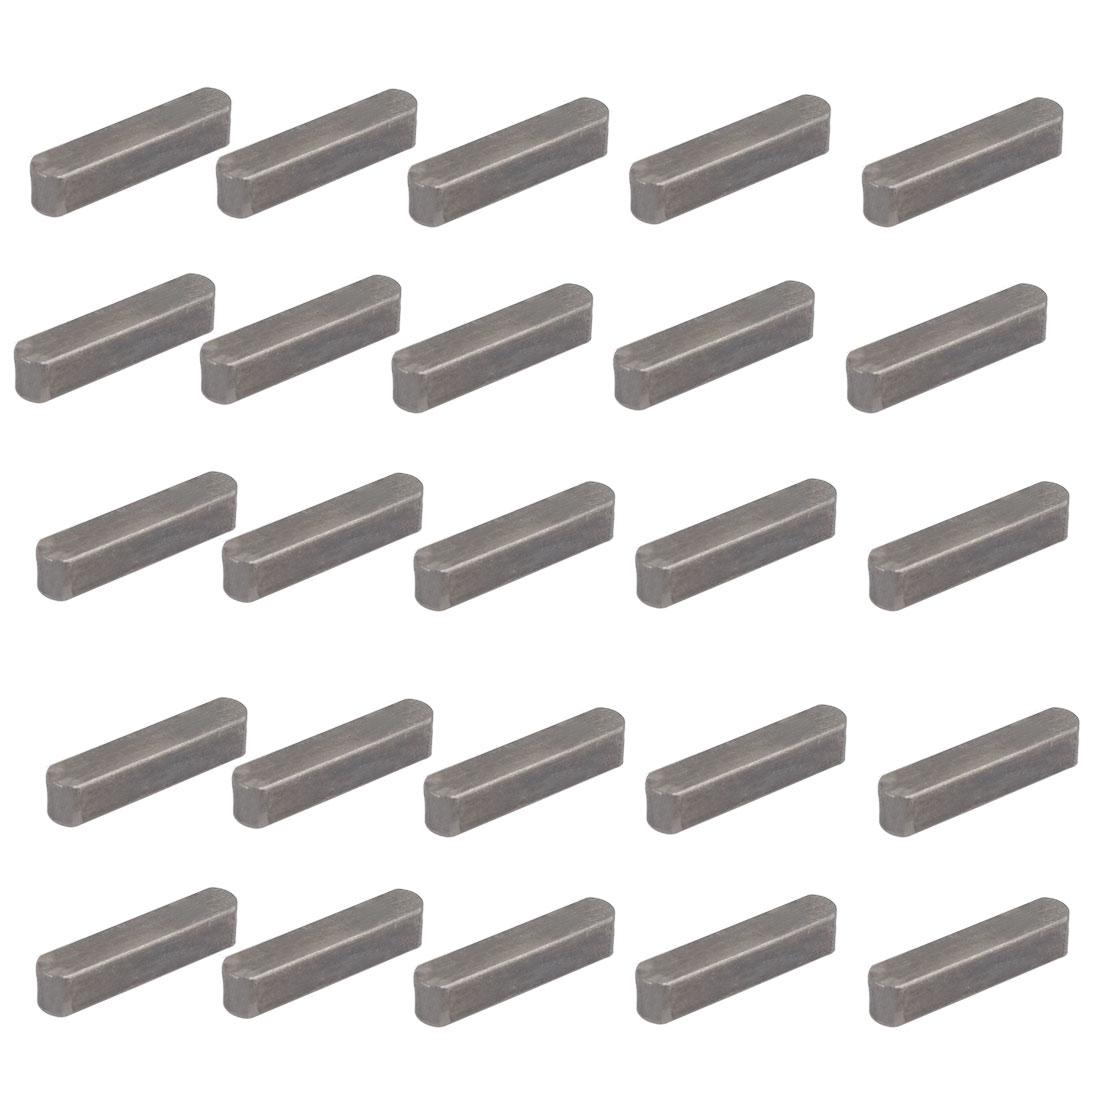 28mmx6mmx6mm Carbon Steel Key Stock To Lock Pulleys 25pcs